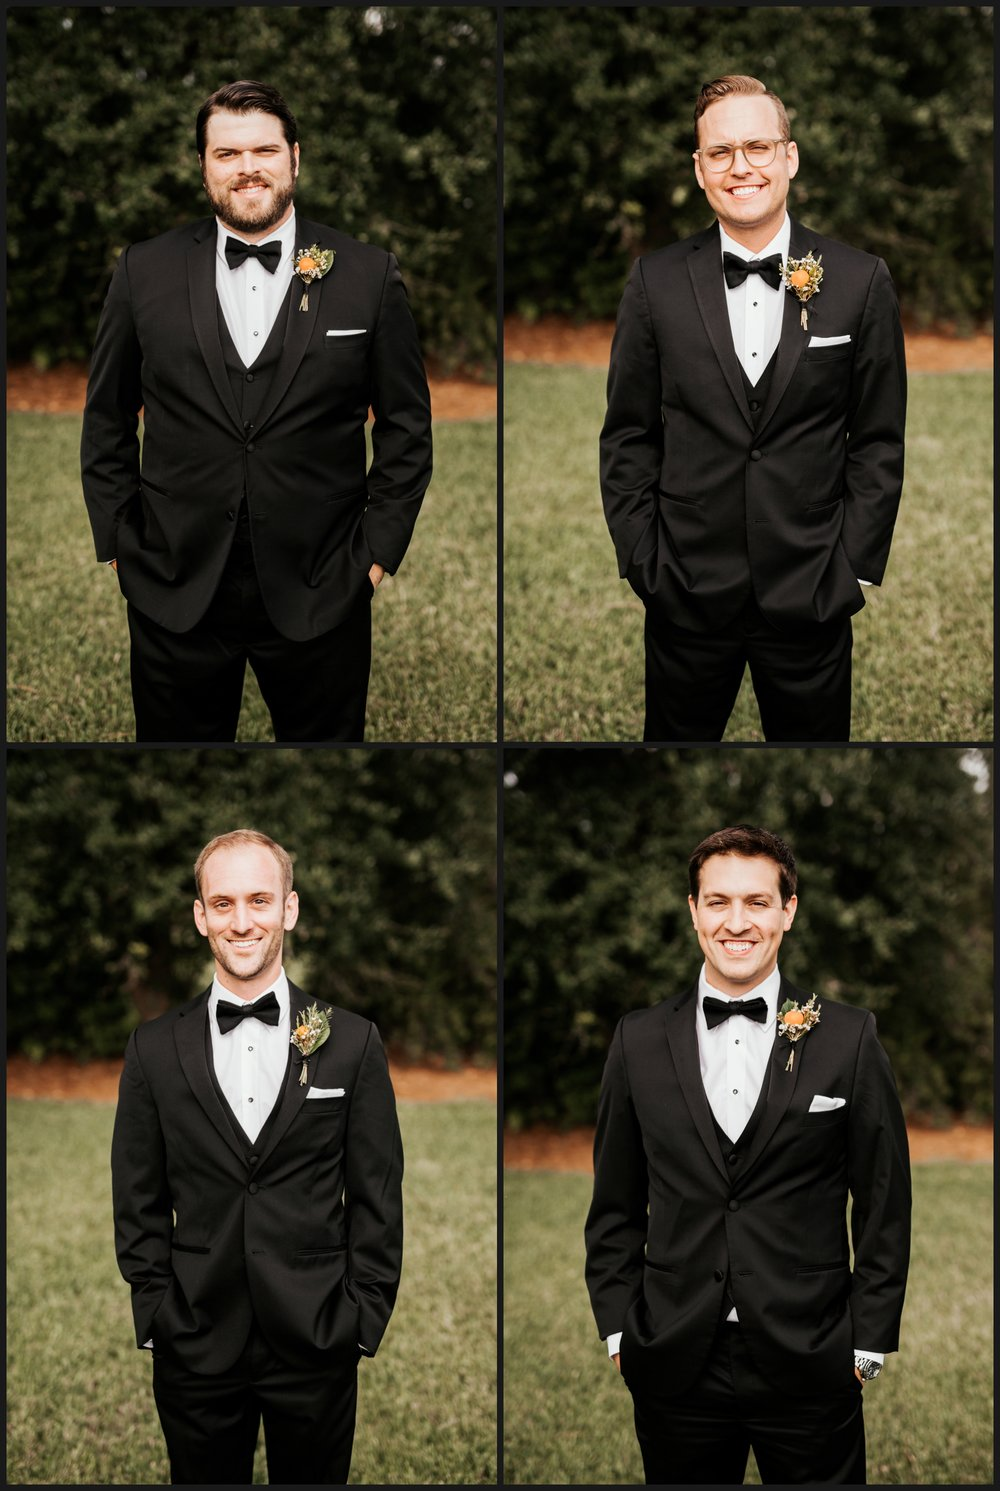 Orlando-Wedding-Photographer-destination-wedding-photographer-florida-wedding-photographer-hawaii-wedding-photographer_0180.jpg